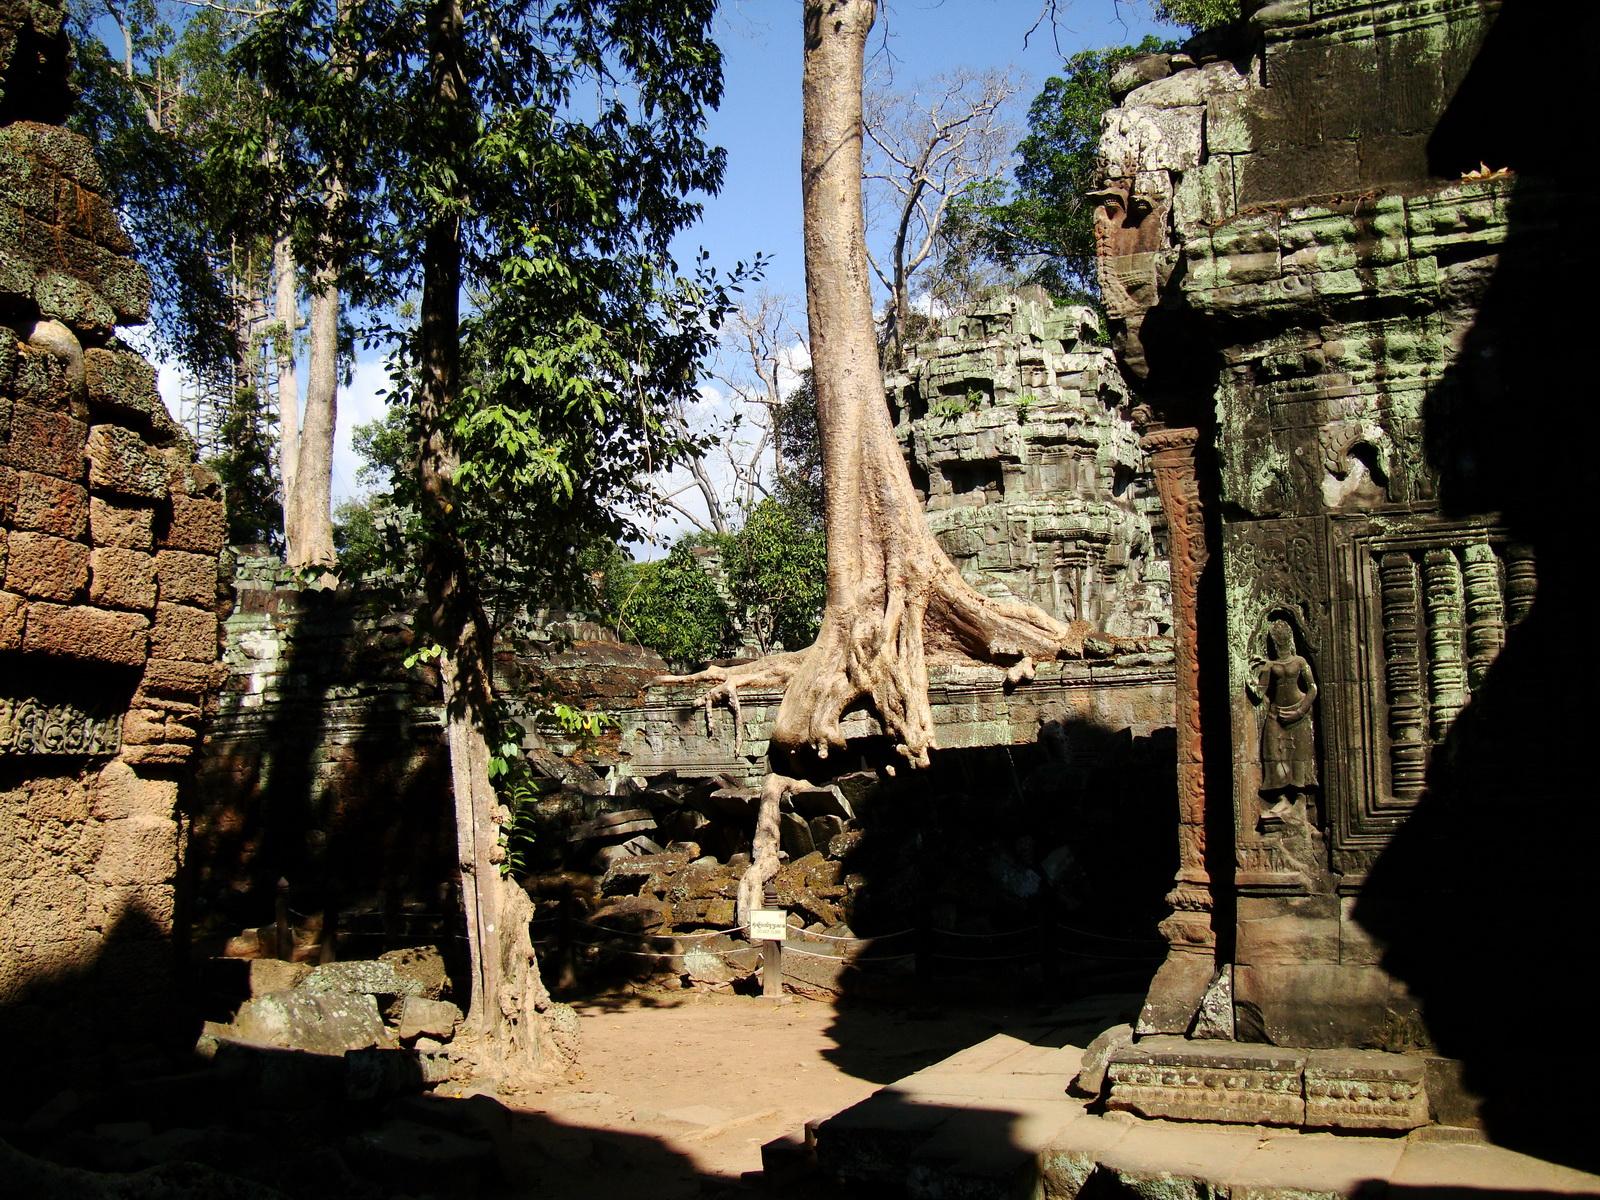 Ta Prohm Temple Tomb Raider giant iconic trees dwaf the gopura 10